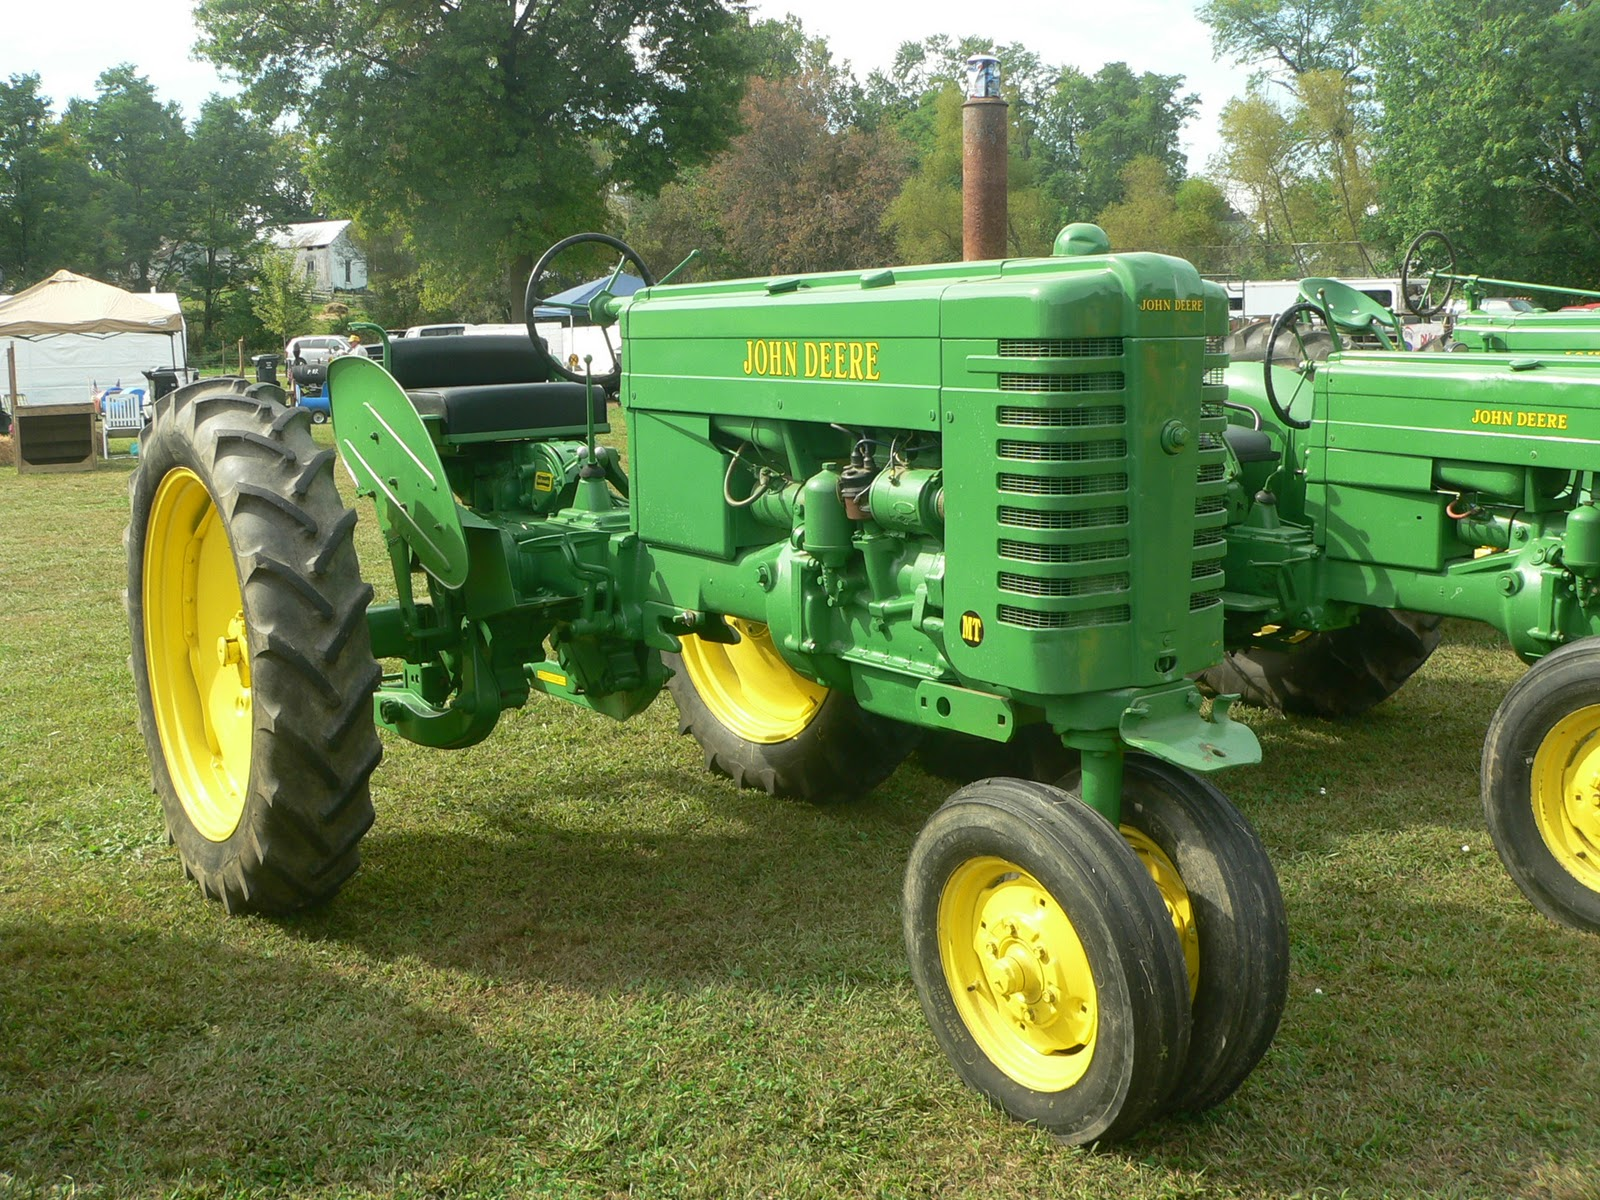 Vintage Farms Tractors For Sales : Antique tractors bing images